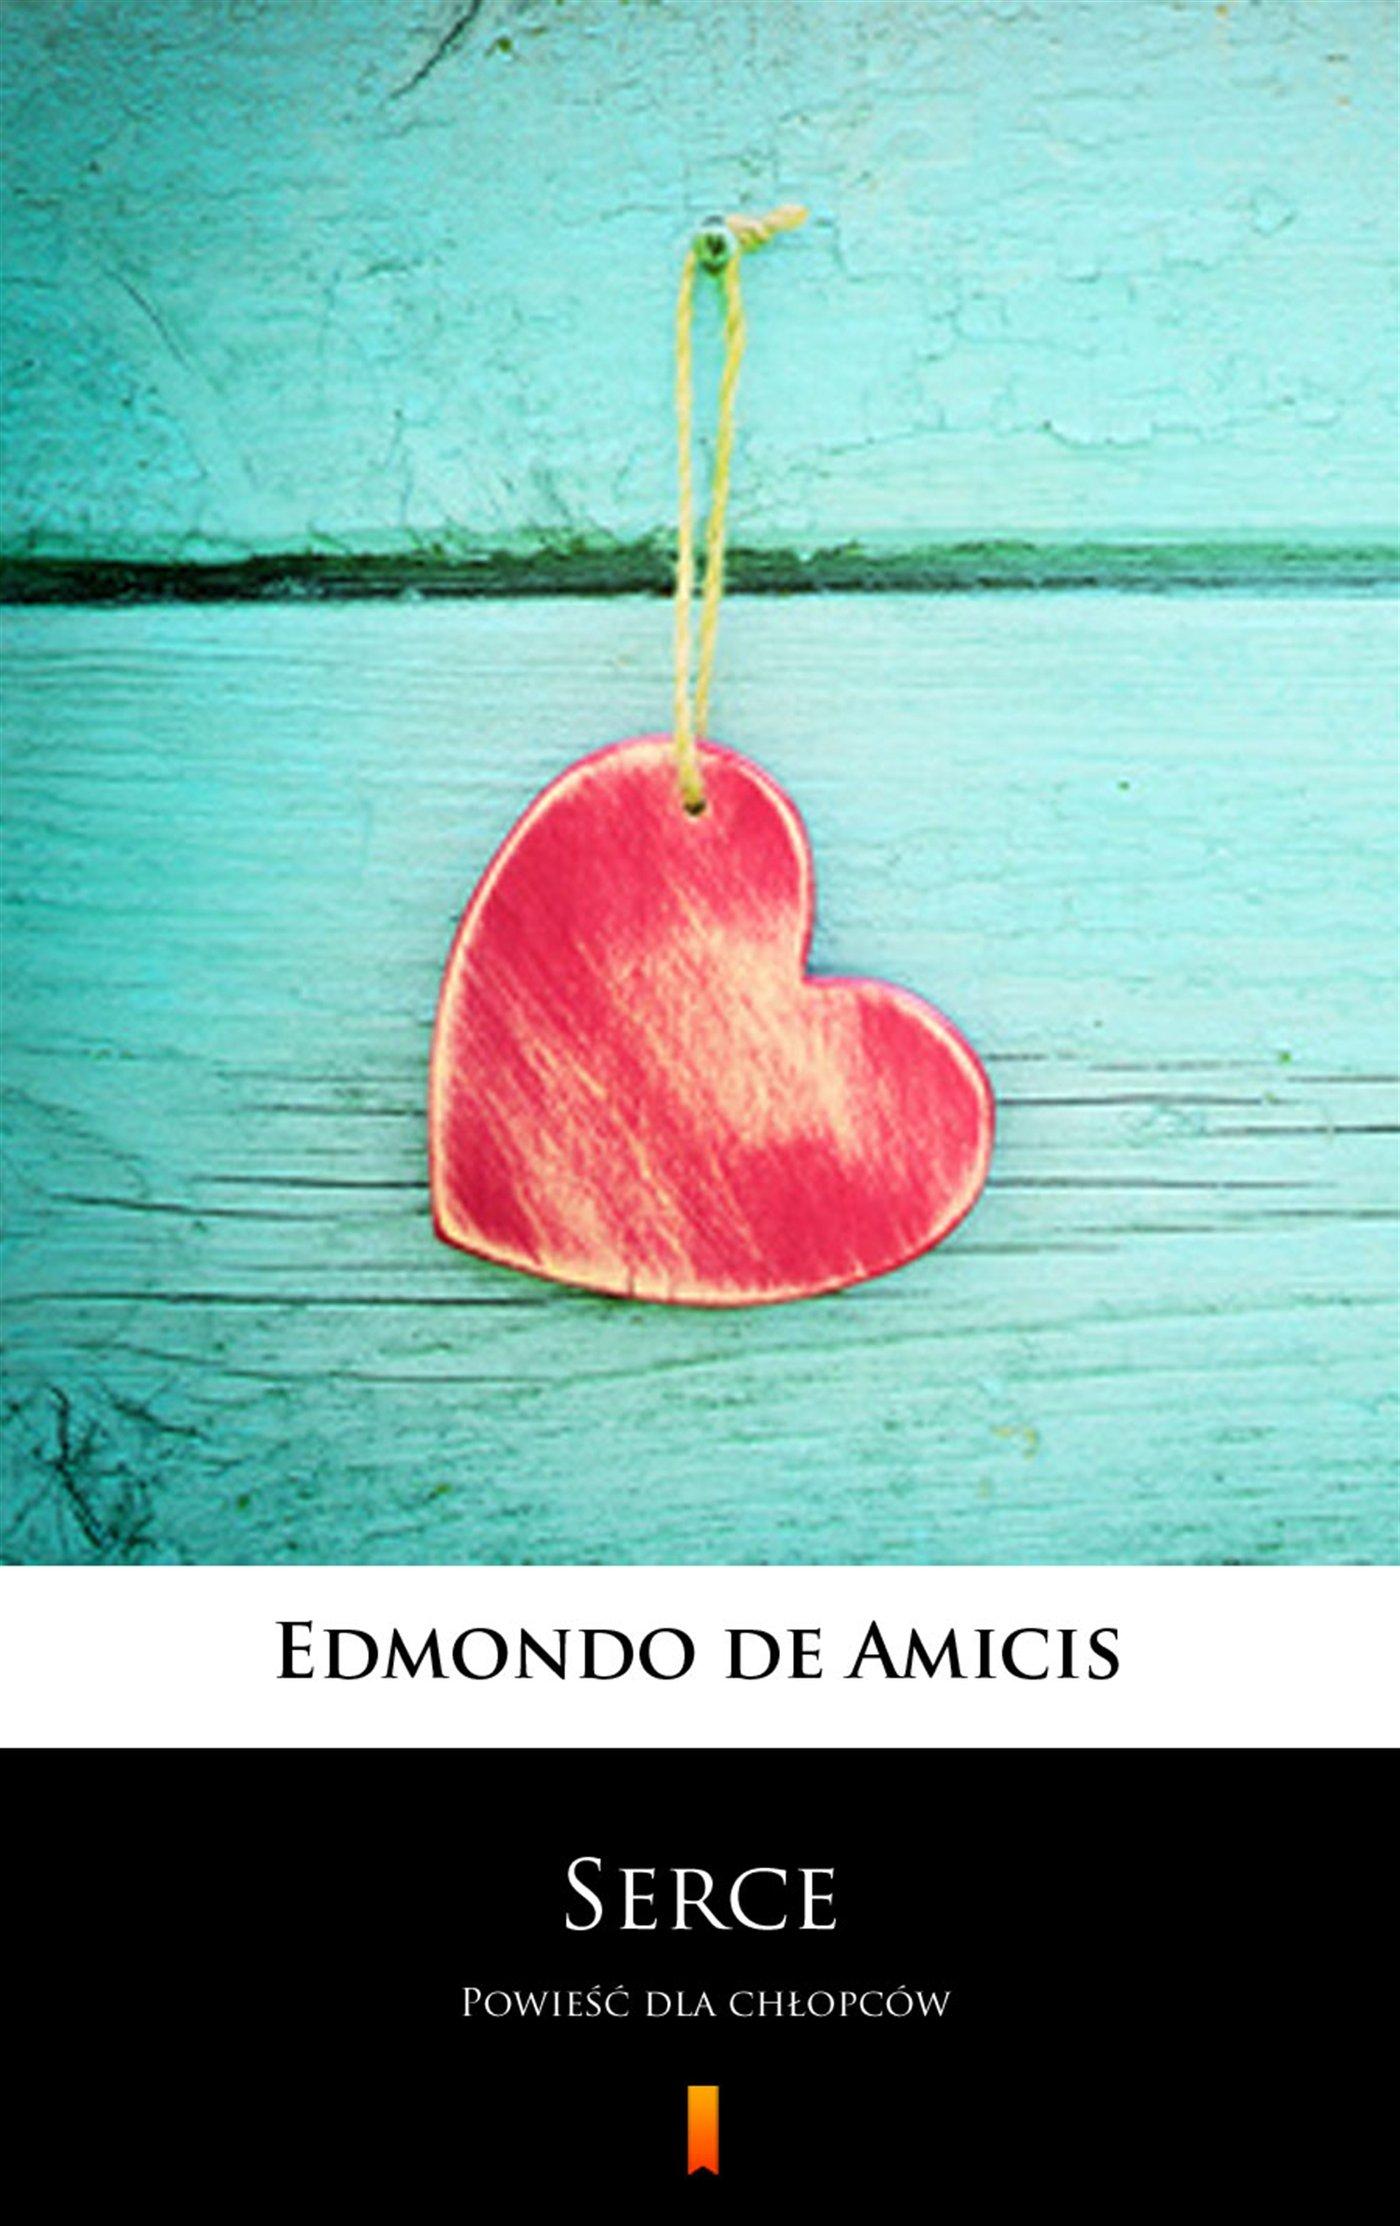 Serce - Ebook (Książka na Kindle) do pobrania w formacie MOBI